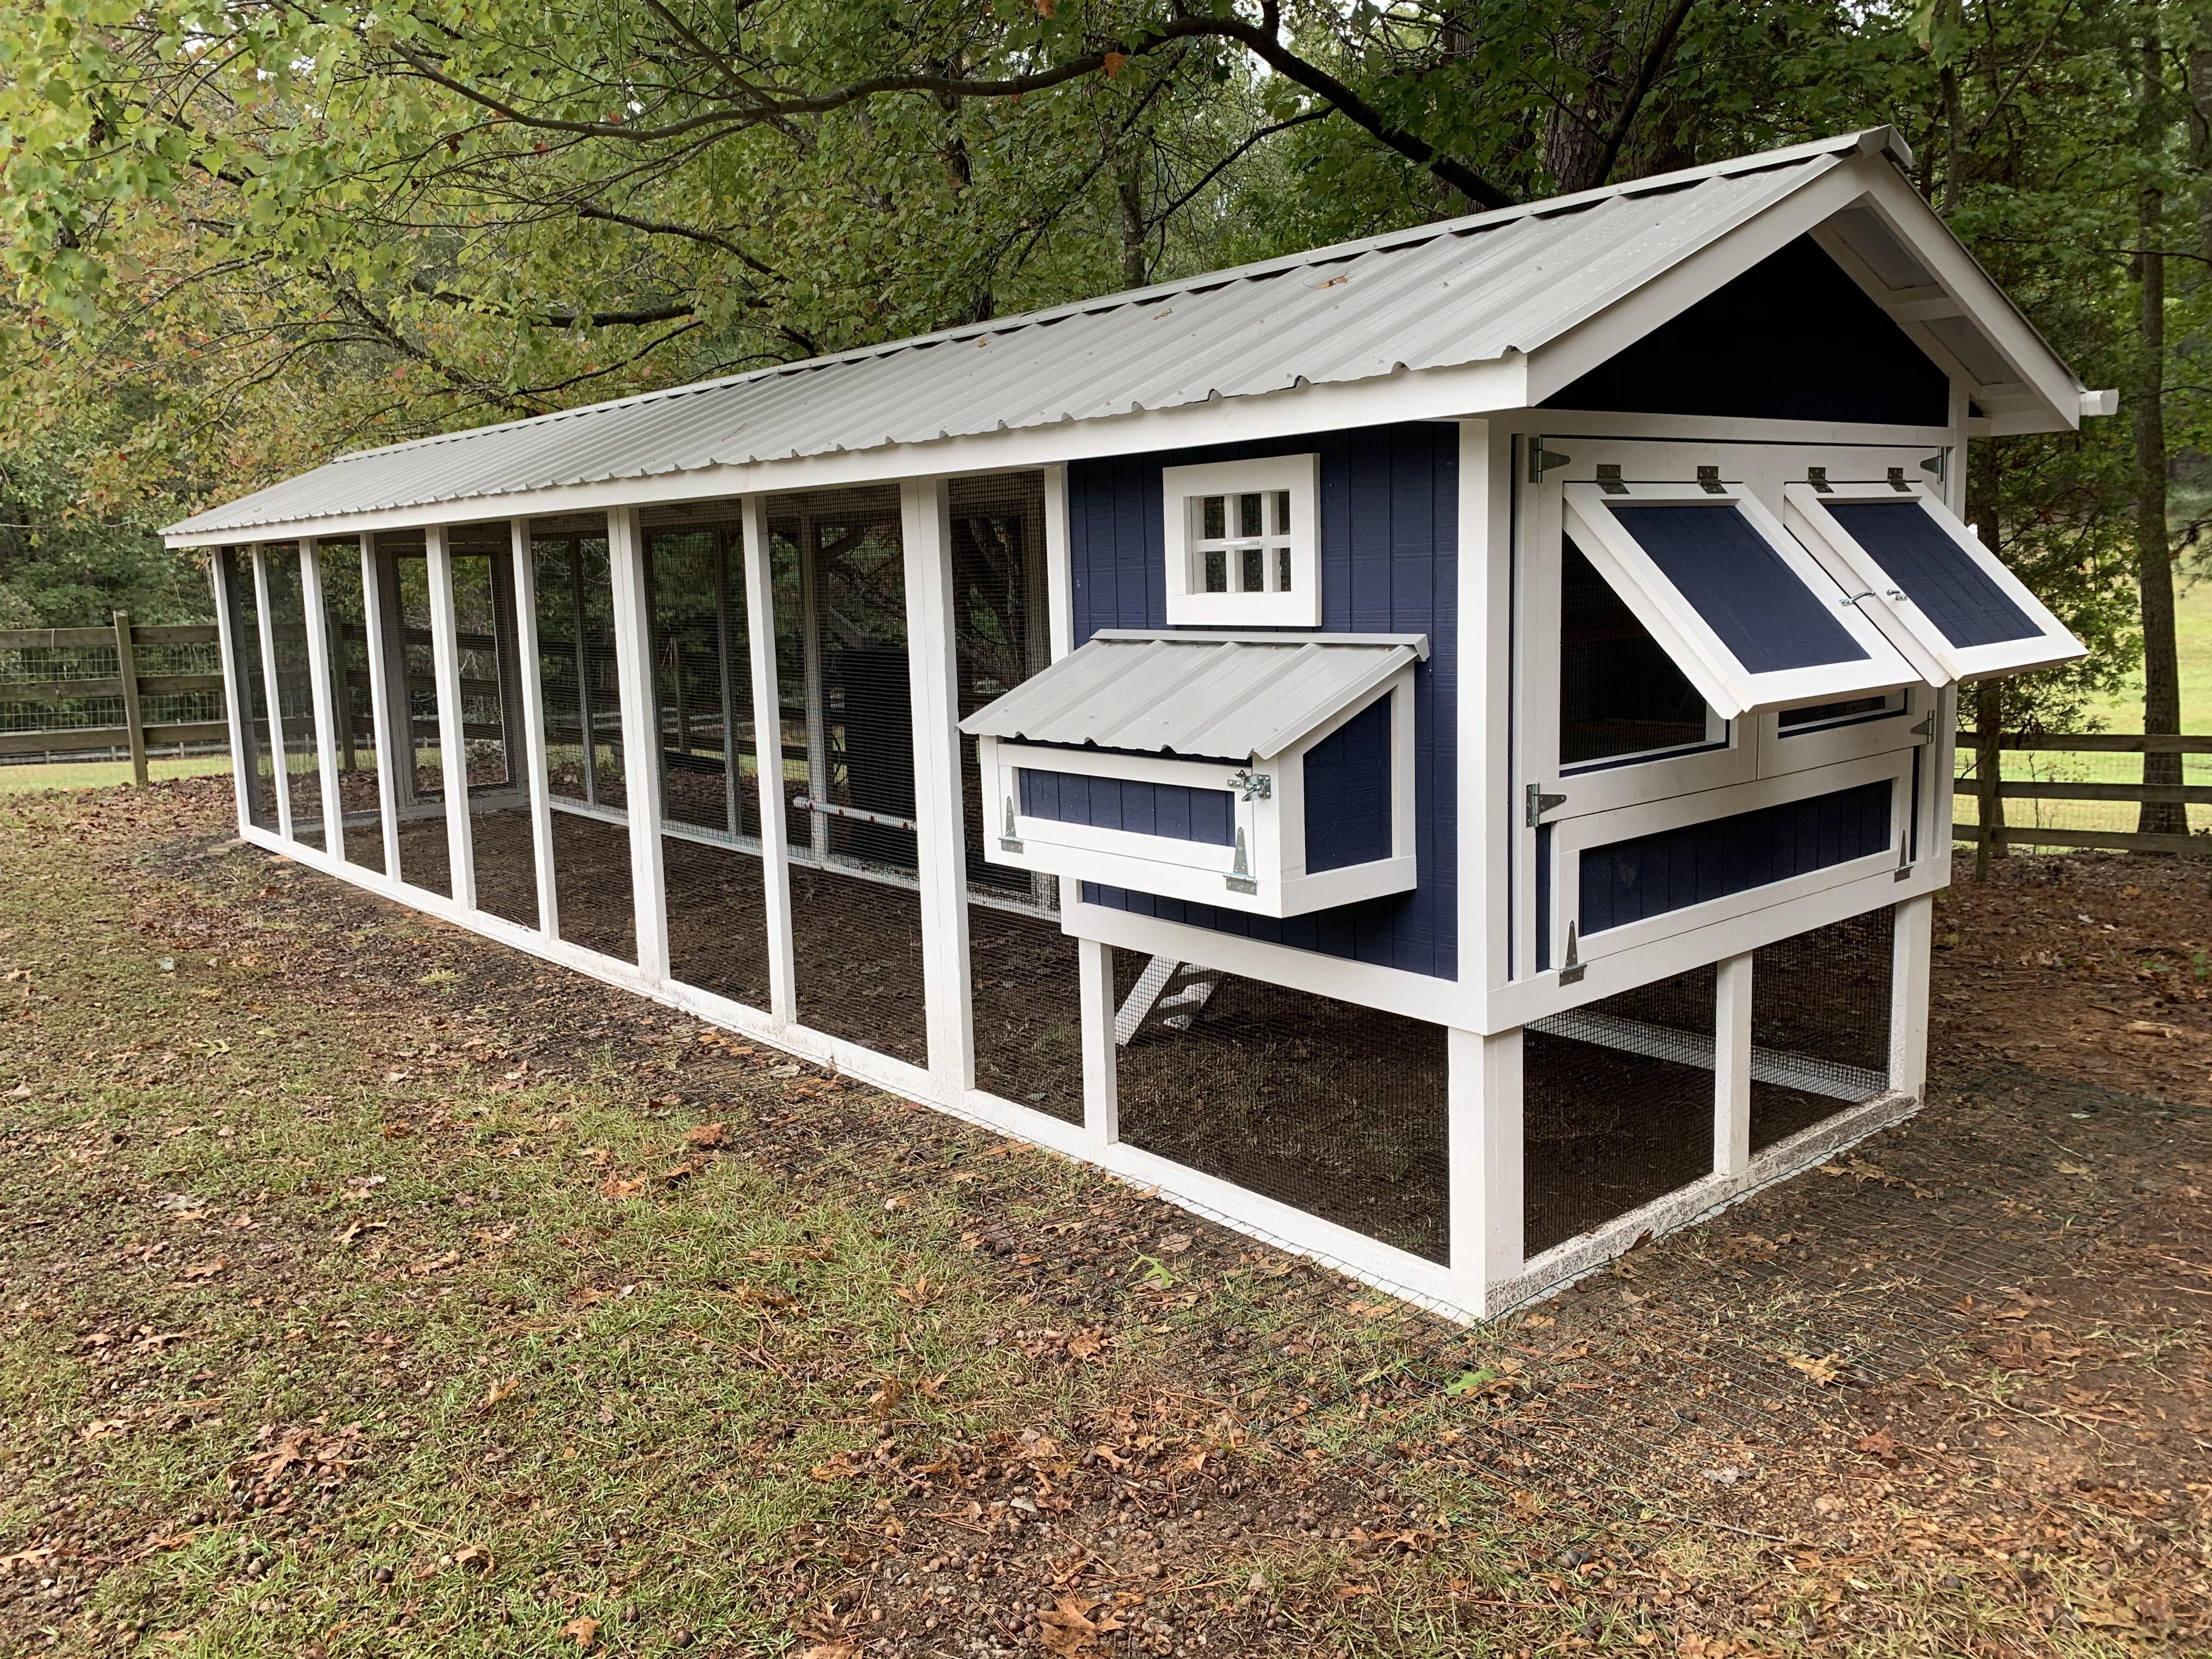 Carolina Coop In 2020 Walk In Chicken Coop Chickens Backyard Cute Chicken Coops